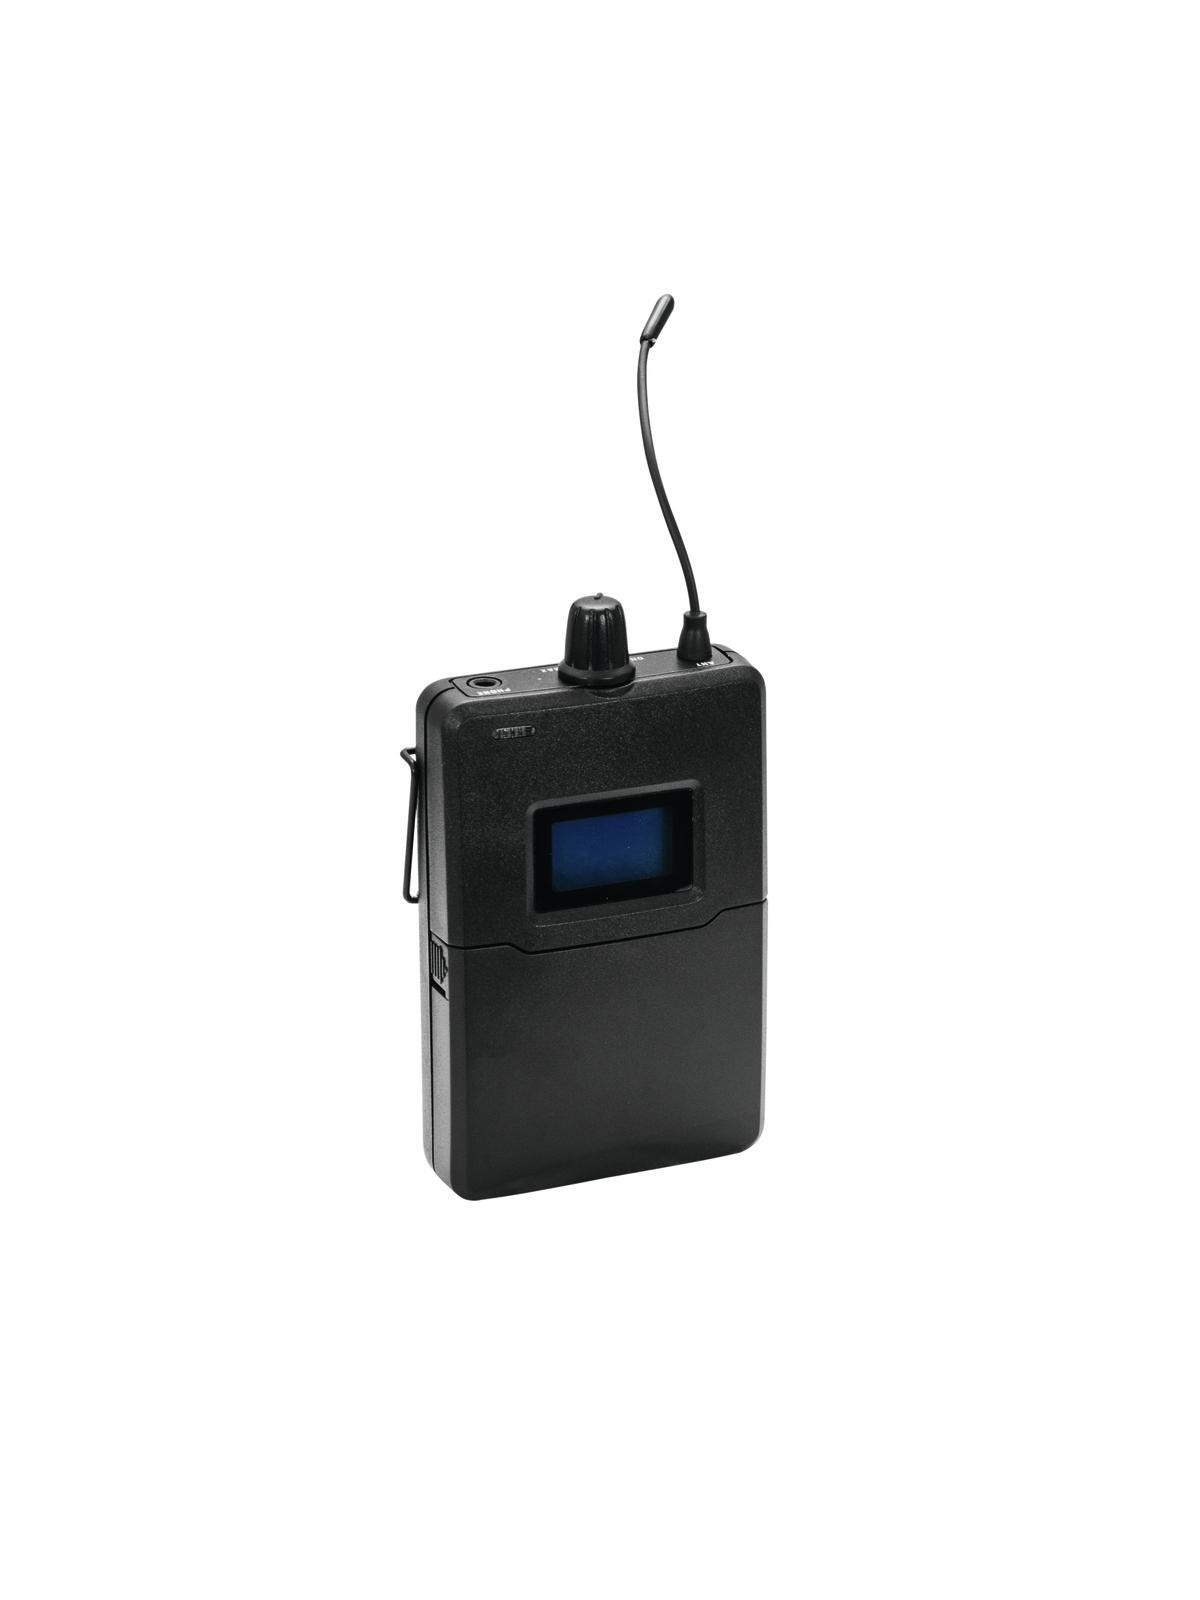 OMNITRONIC STR-1000 ricevitore radiomicrofono UHF in-ear  IEM-1000